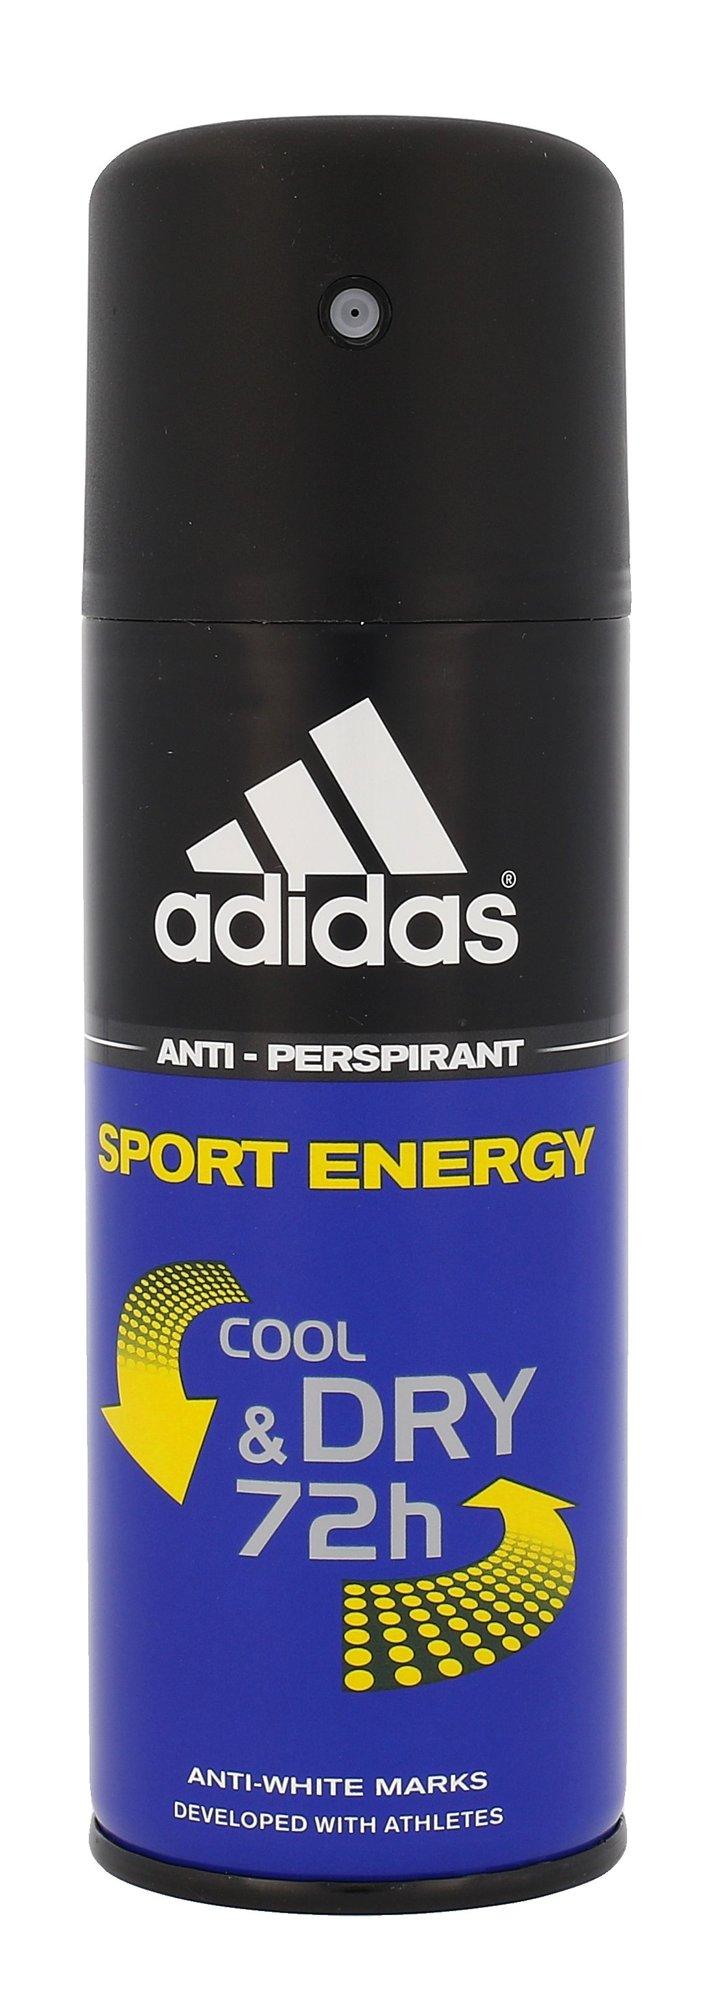 Antisperantas Adidas Sport Energy Cool & Dry 72h